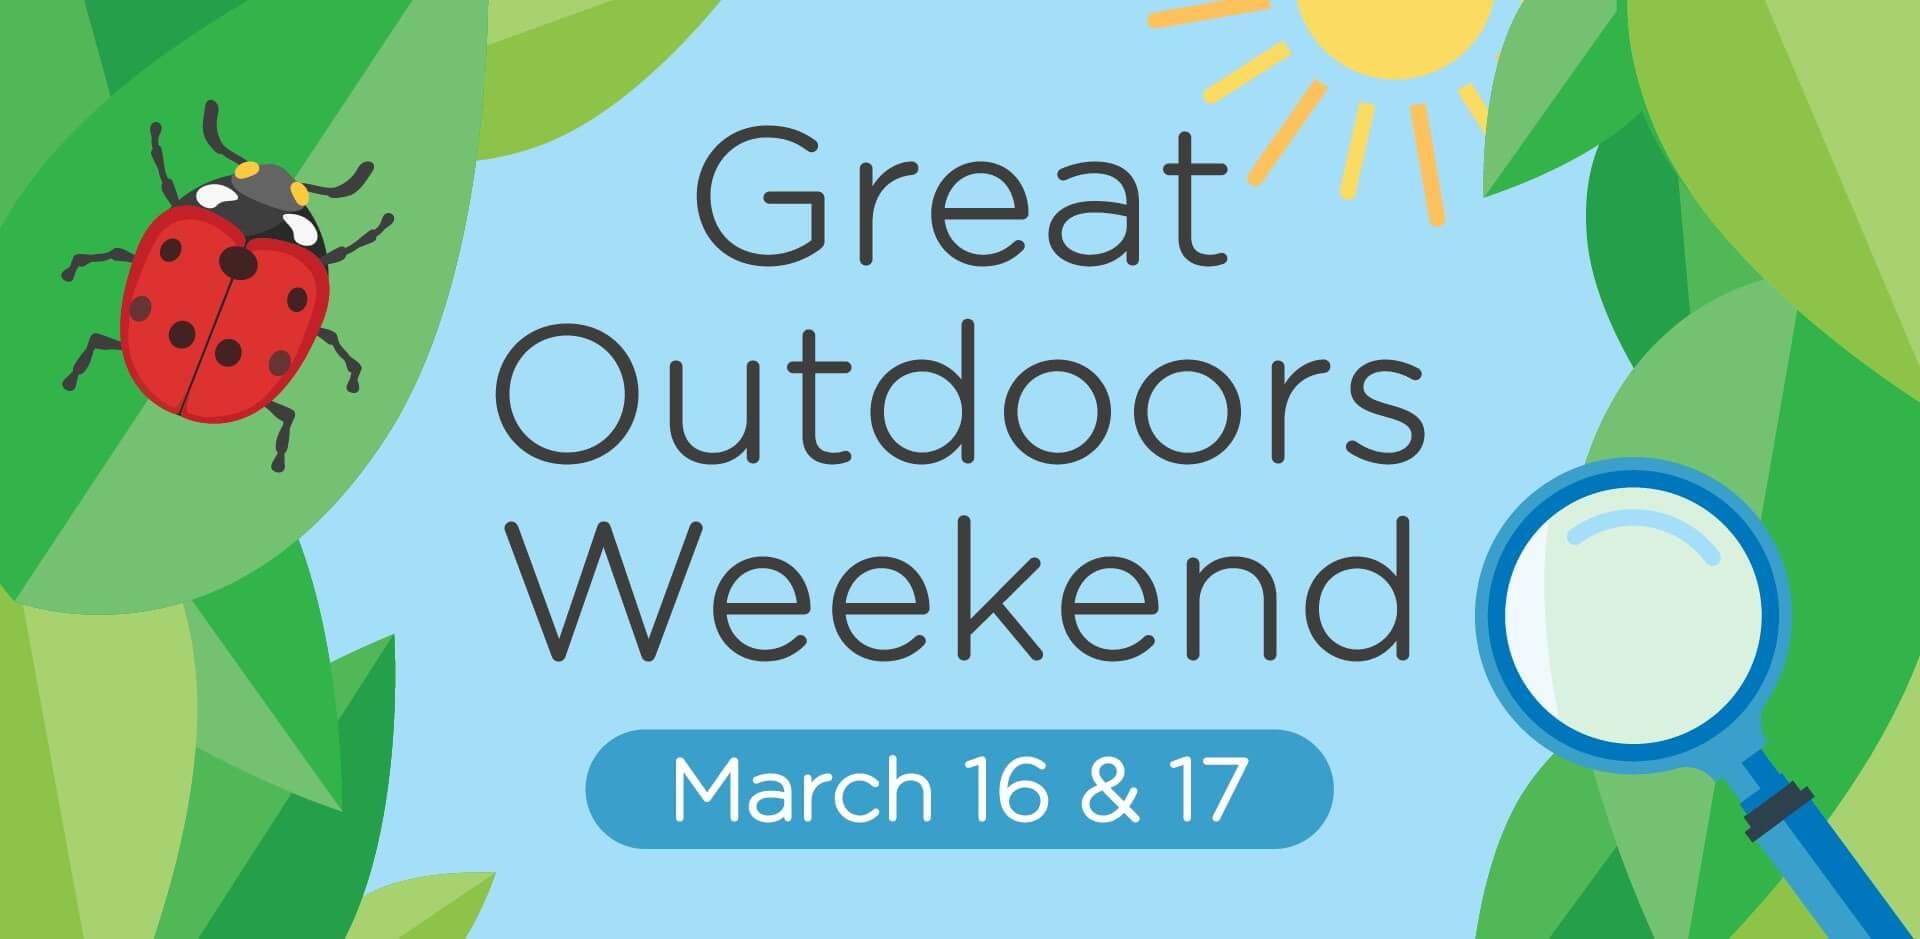 Great Outdoors Weekend Flyer